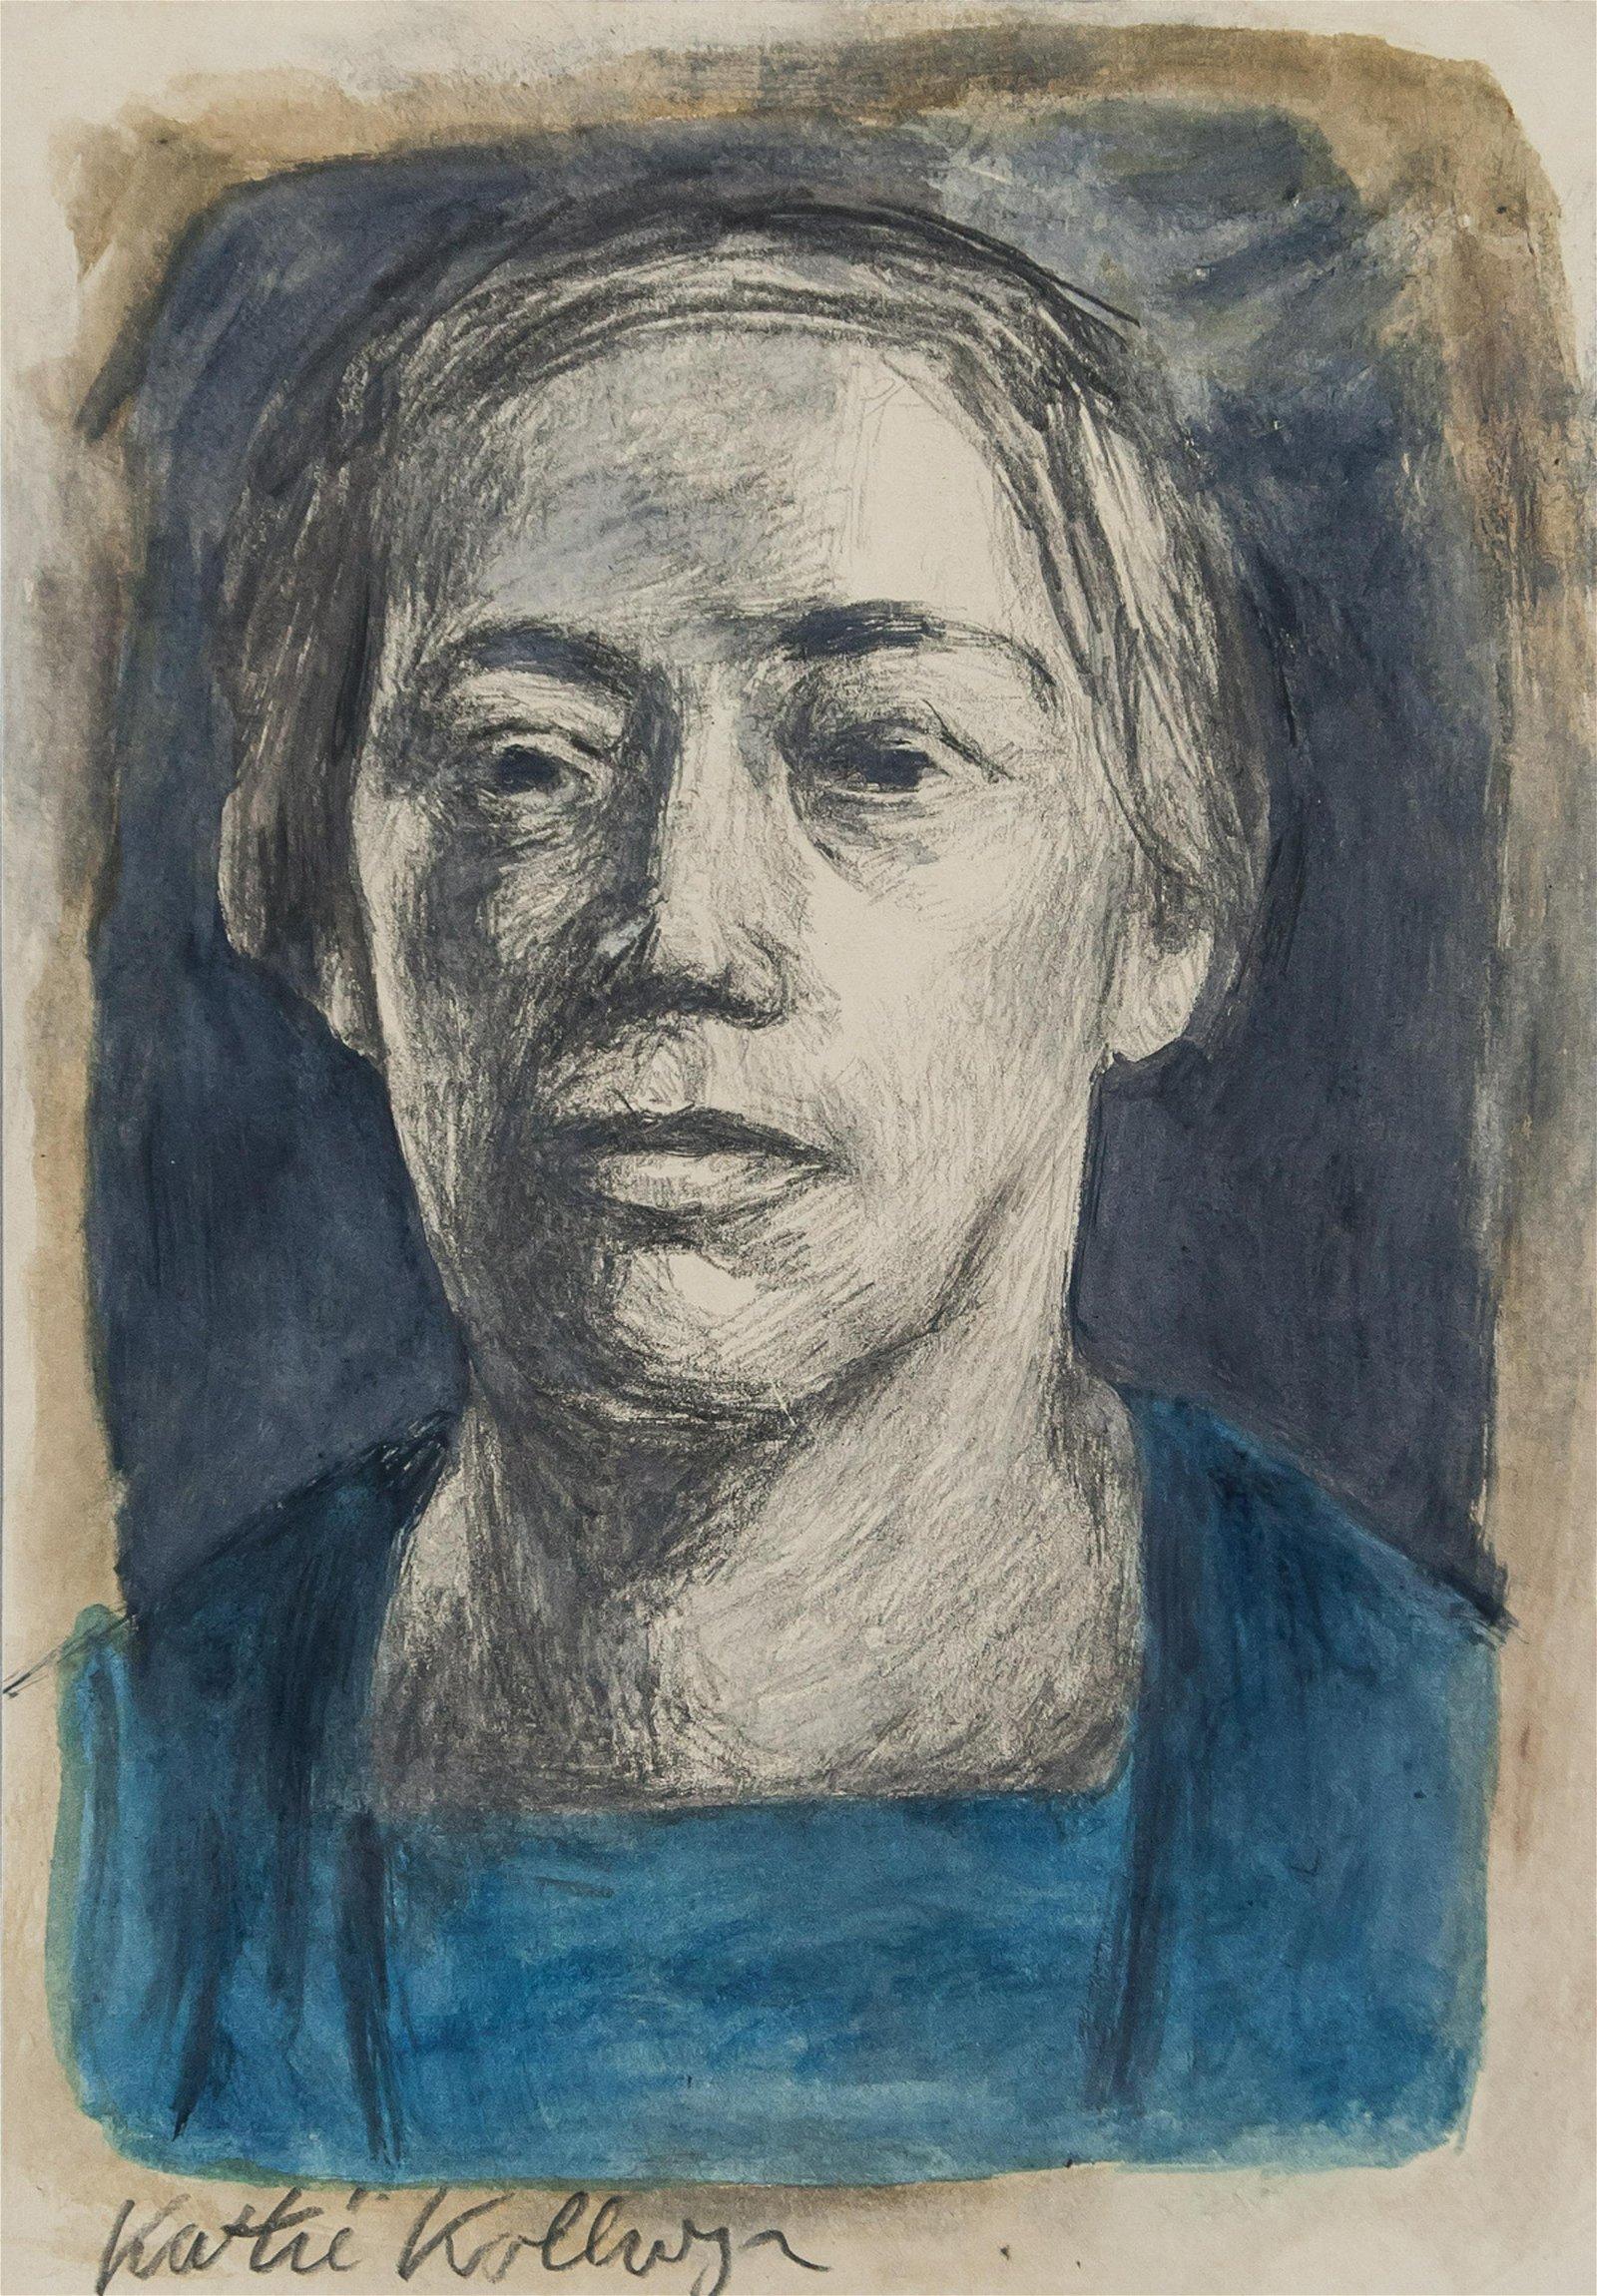 Kathe Kollwitz German Expressionist Mixed Media